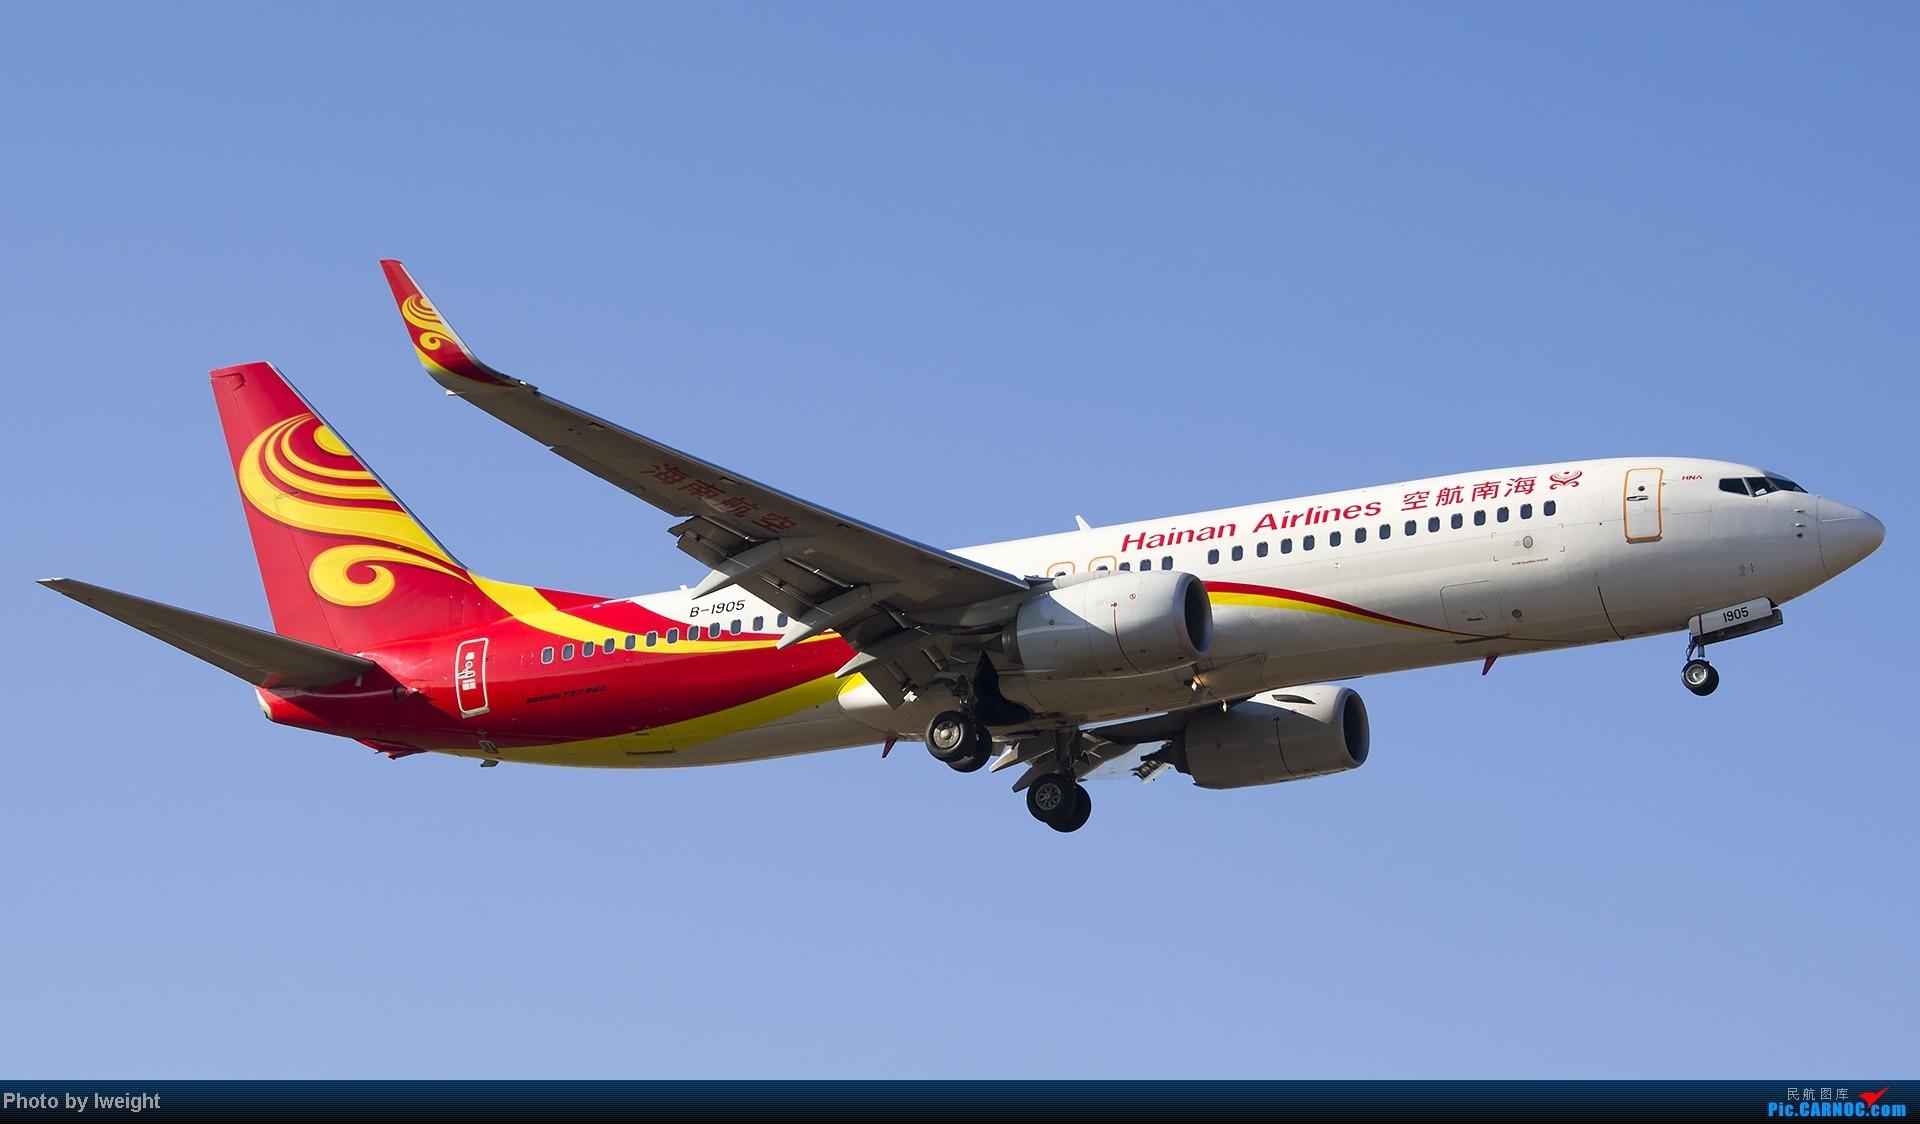 Re:[原创]抓住APEC蓝的尾巴,再拍上一组 BOEING 737-800 B-1905 中国北京首都机场